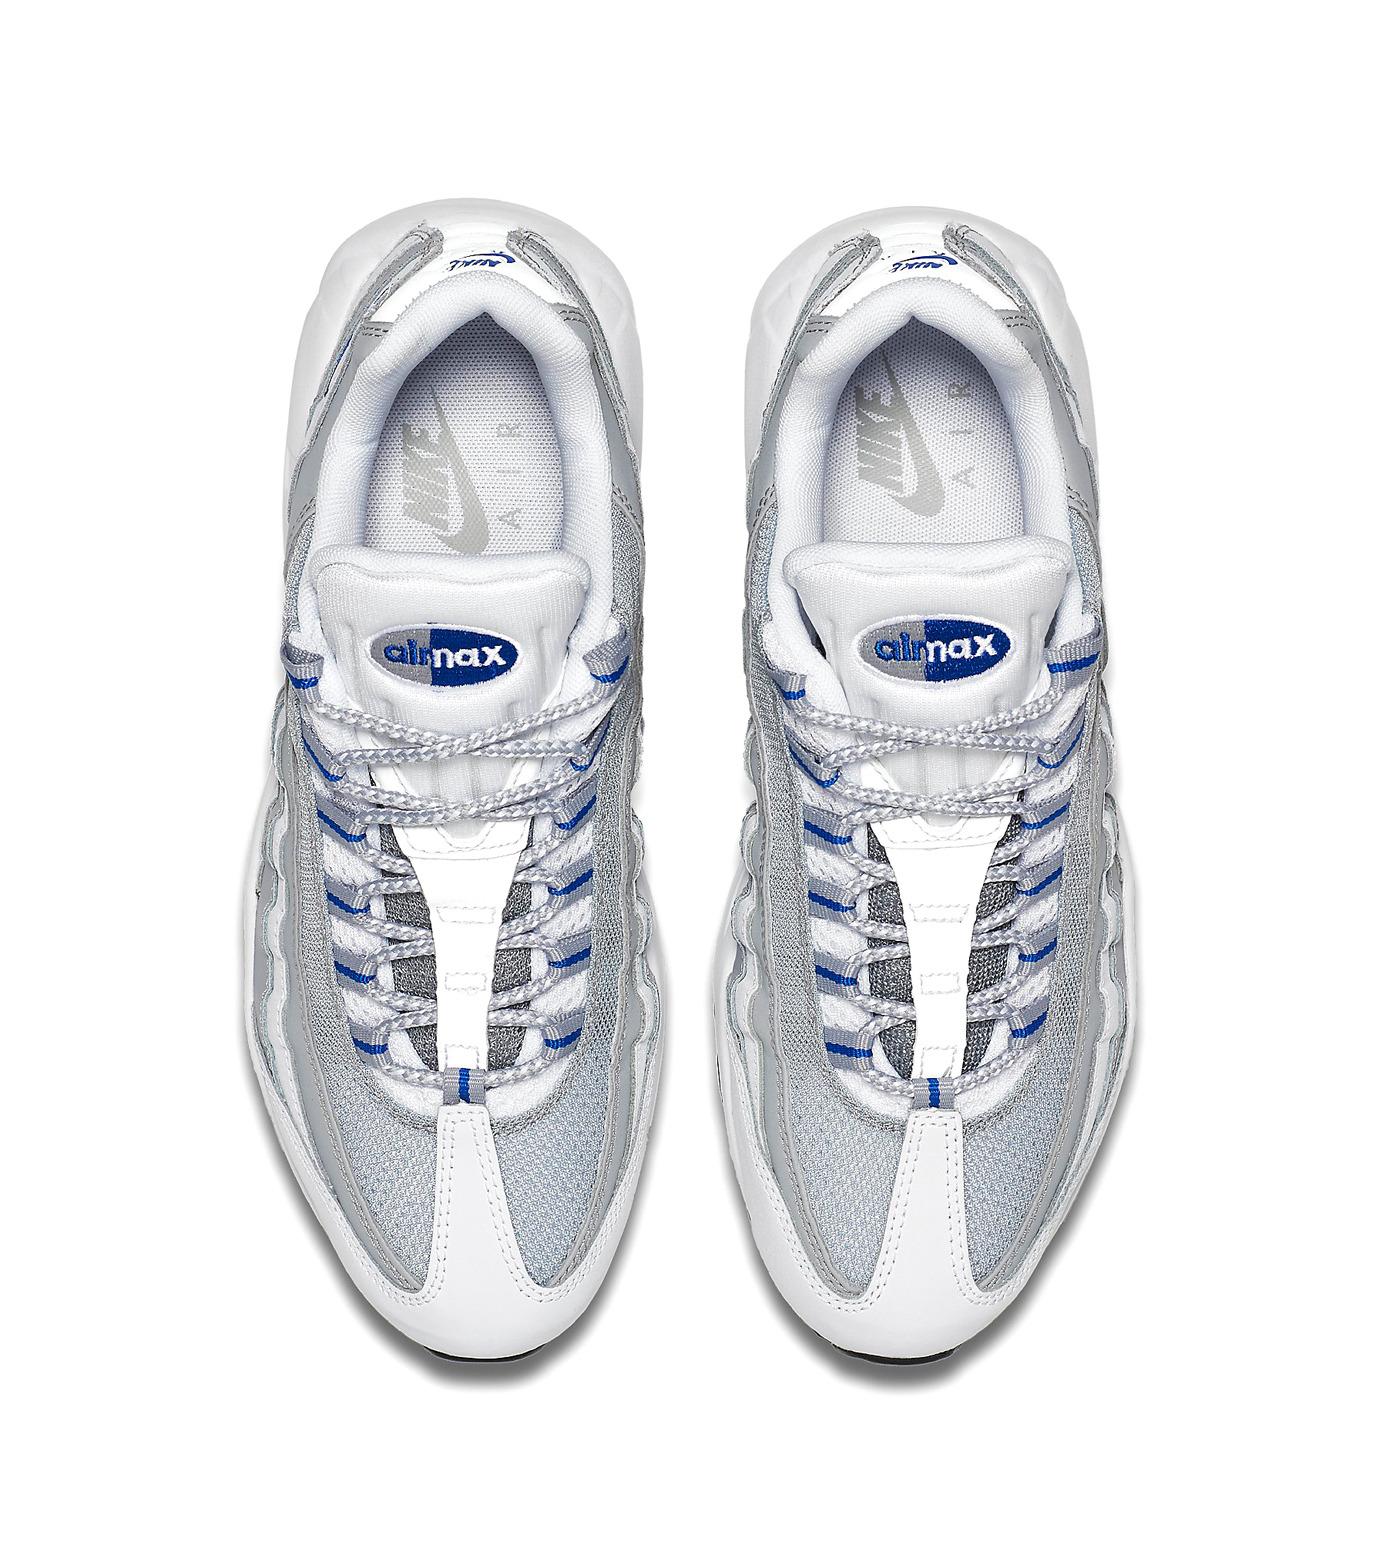 NIKE(ナイキ)のAIR MAX 95 ESSENTIAL-WHITE(シューズ/shoes)-749766-104-4 拡大詳細画像4